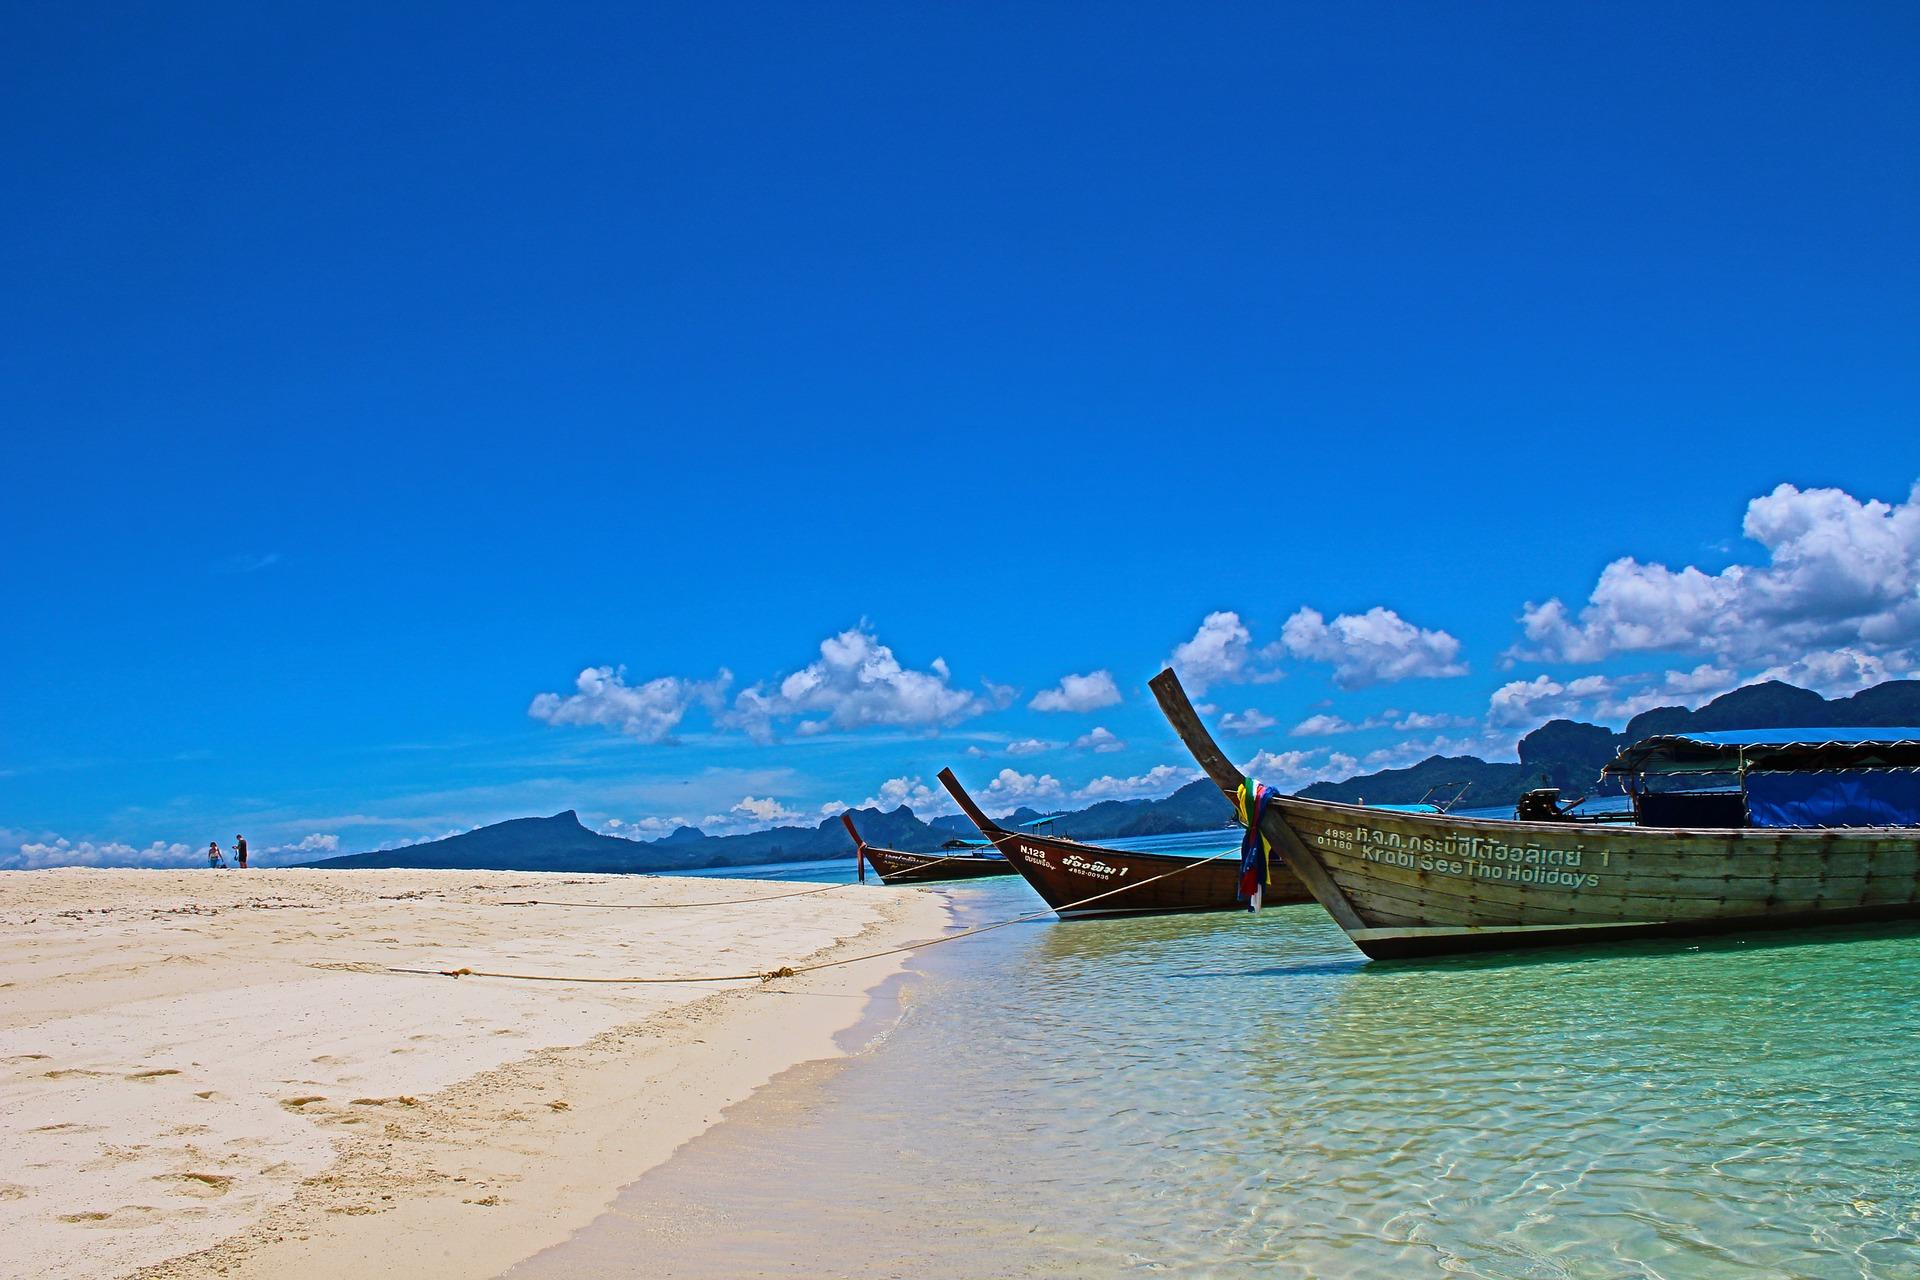 Das Krabi Resort liegt direkt am Klong Muang Beach , genießt diese traumhaften Strände